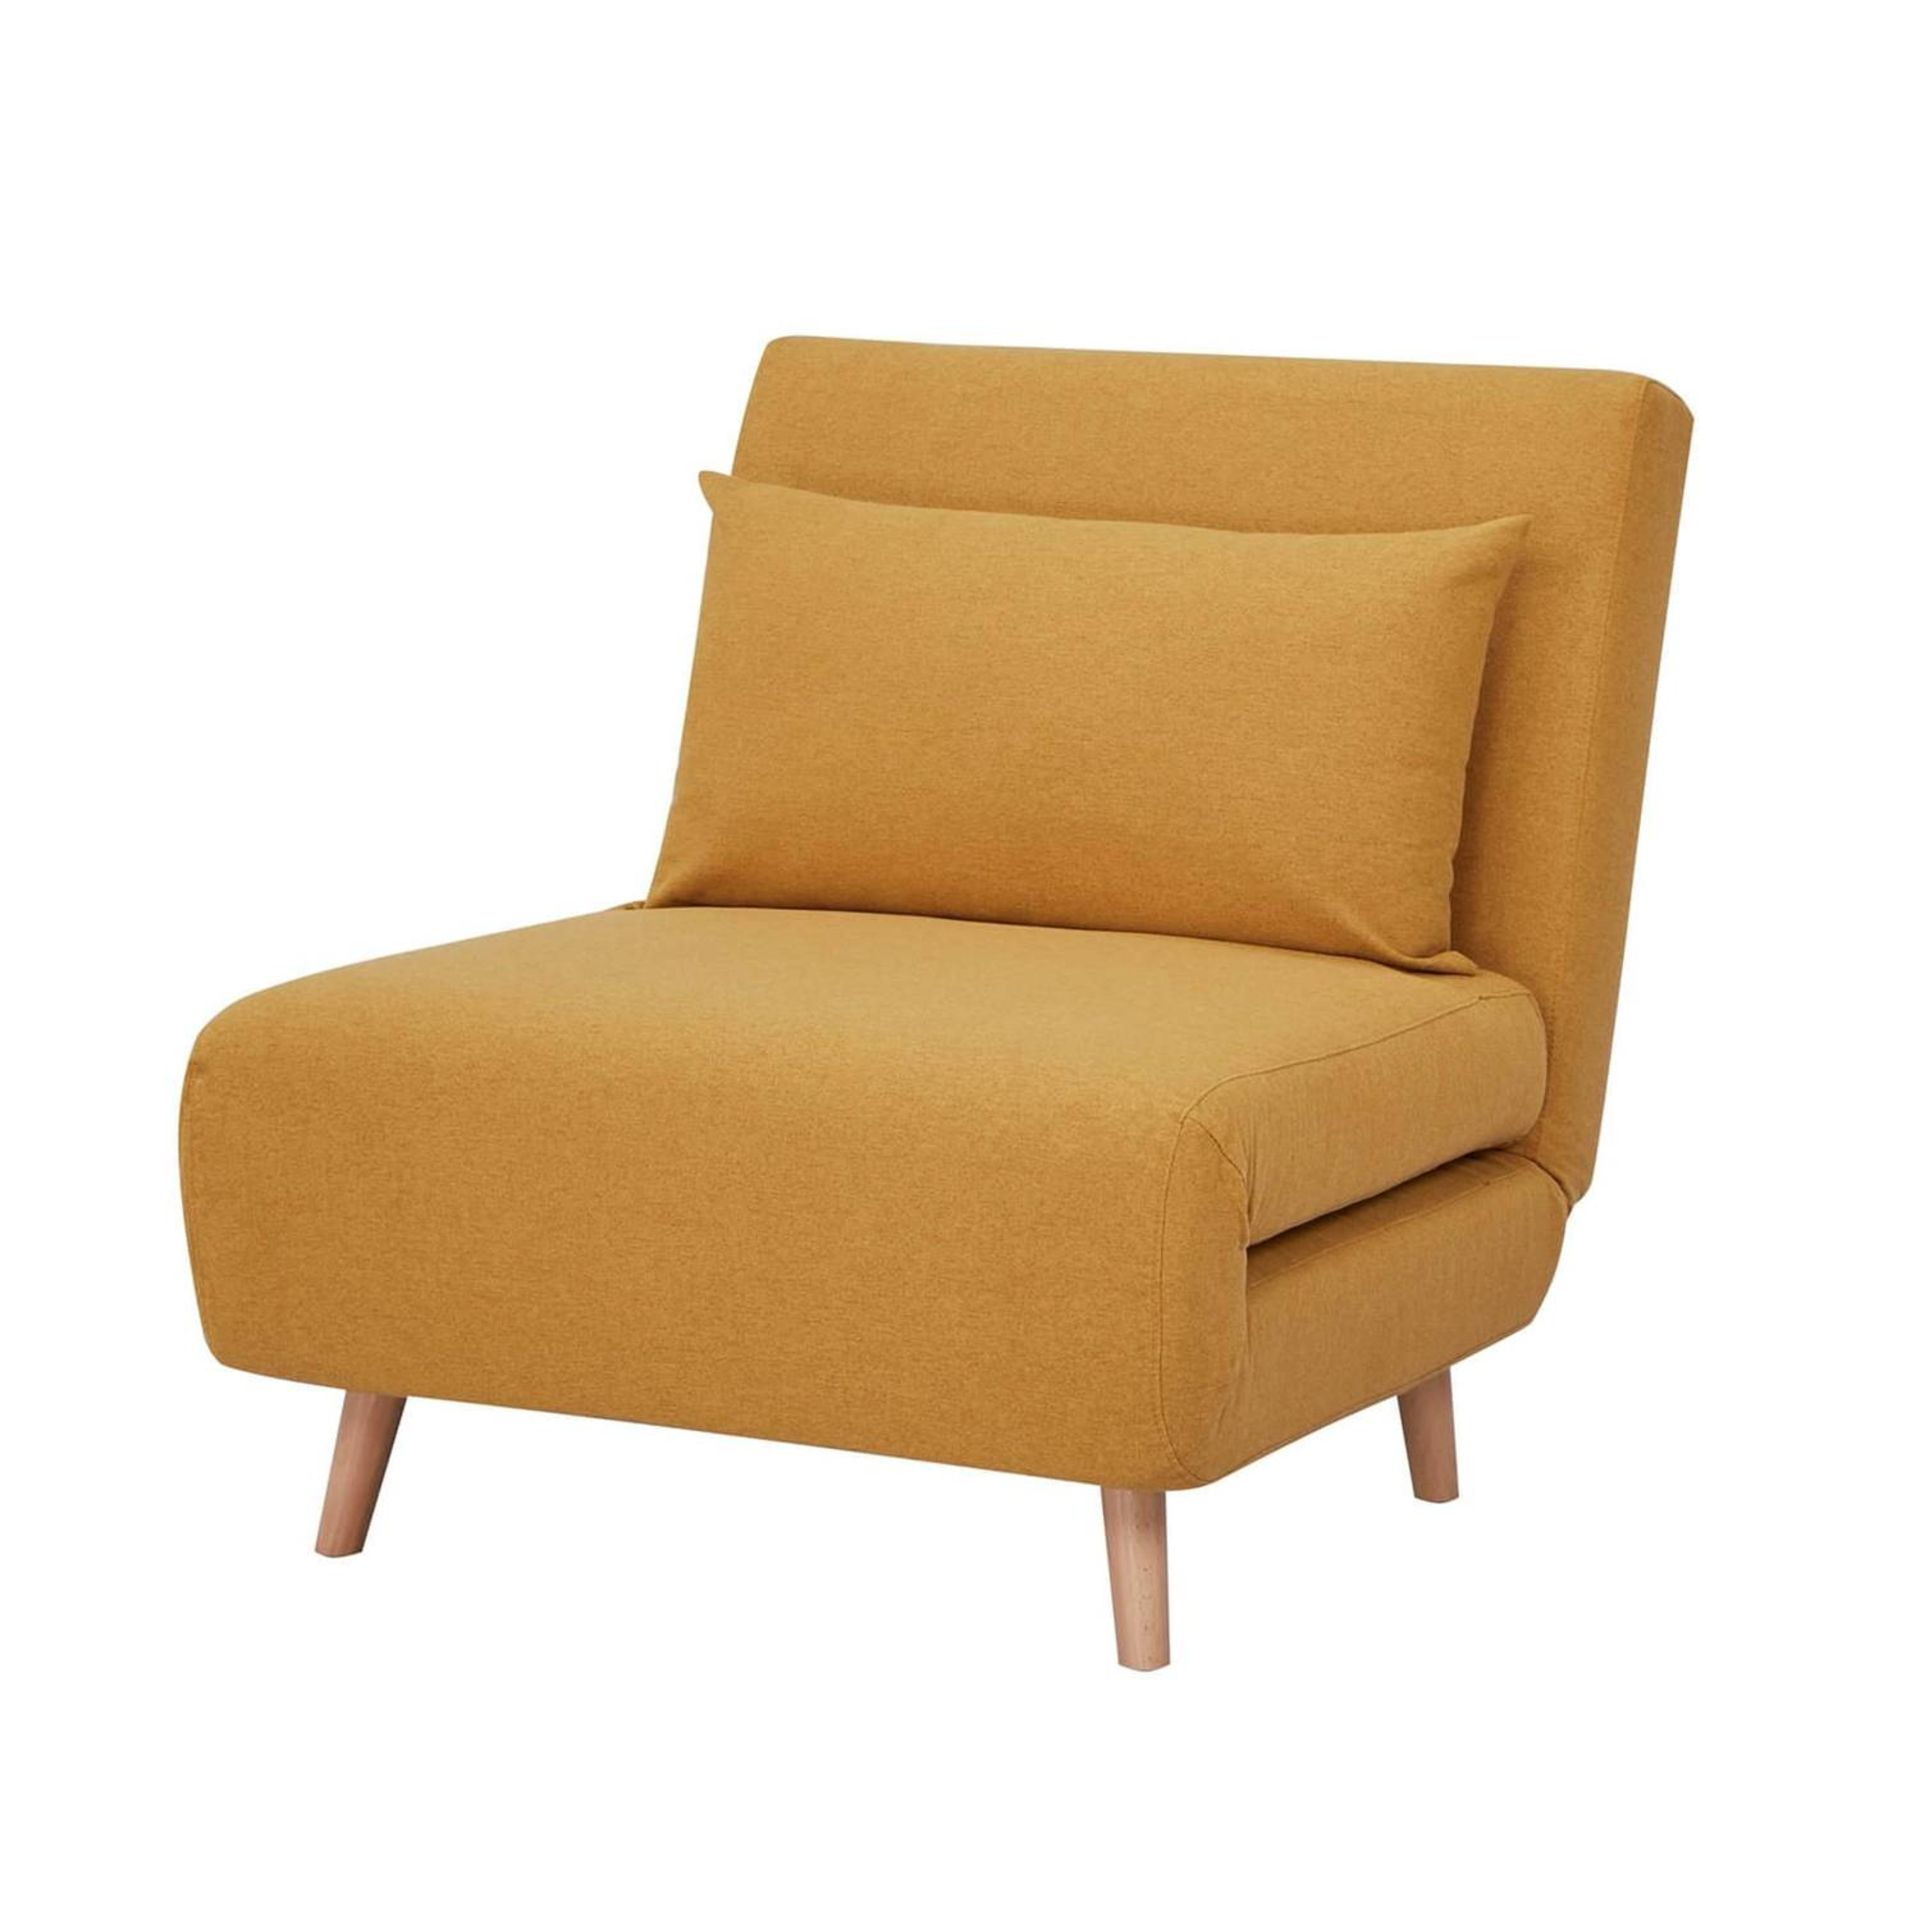 (3D) 1x Freya Folding Chair Bed Ochre. RRP £200.00. - Image 2 of 3